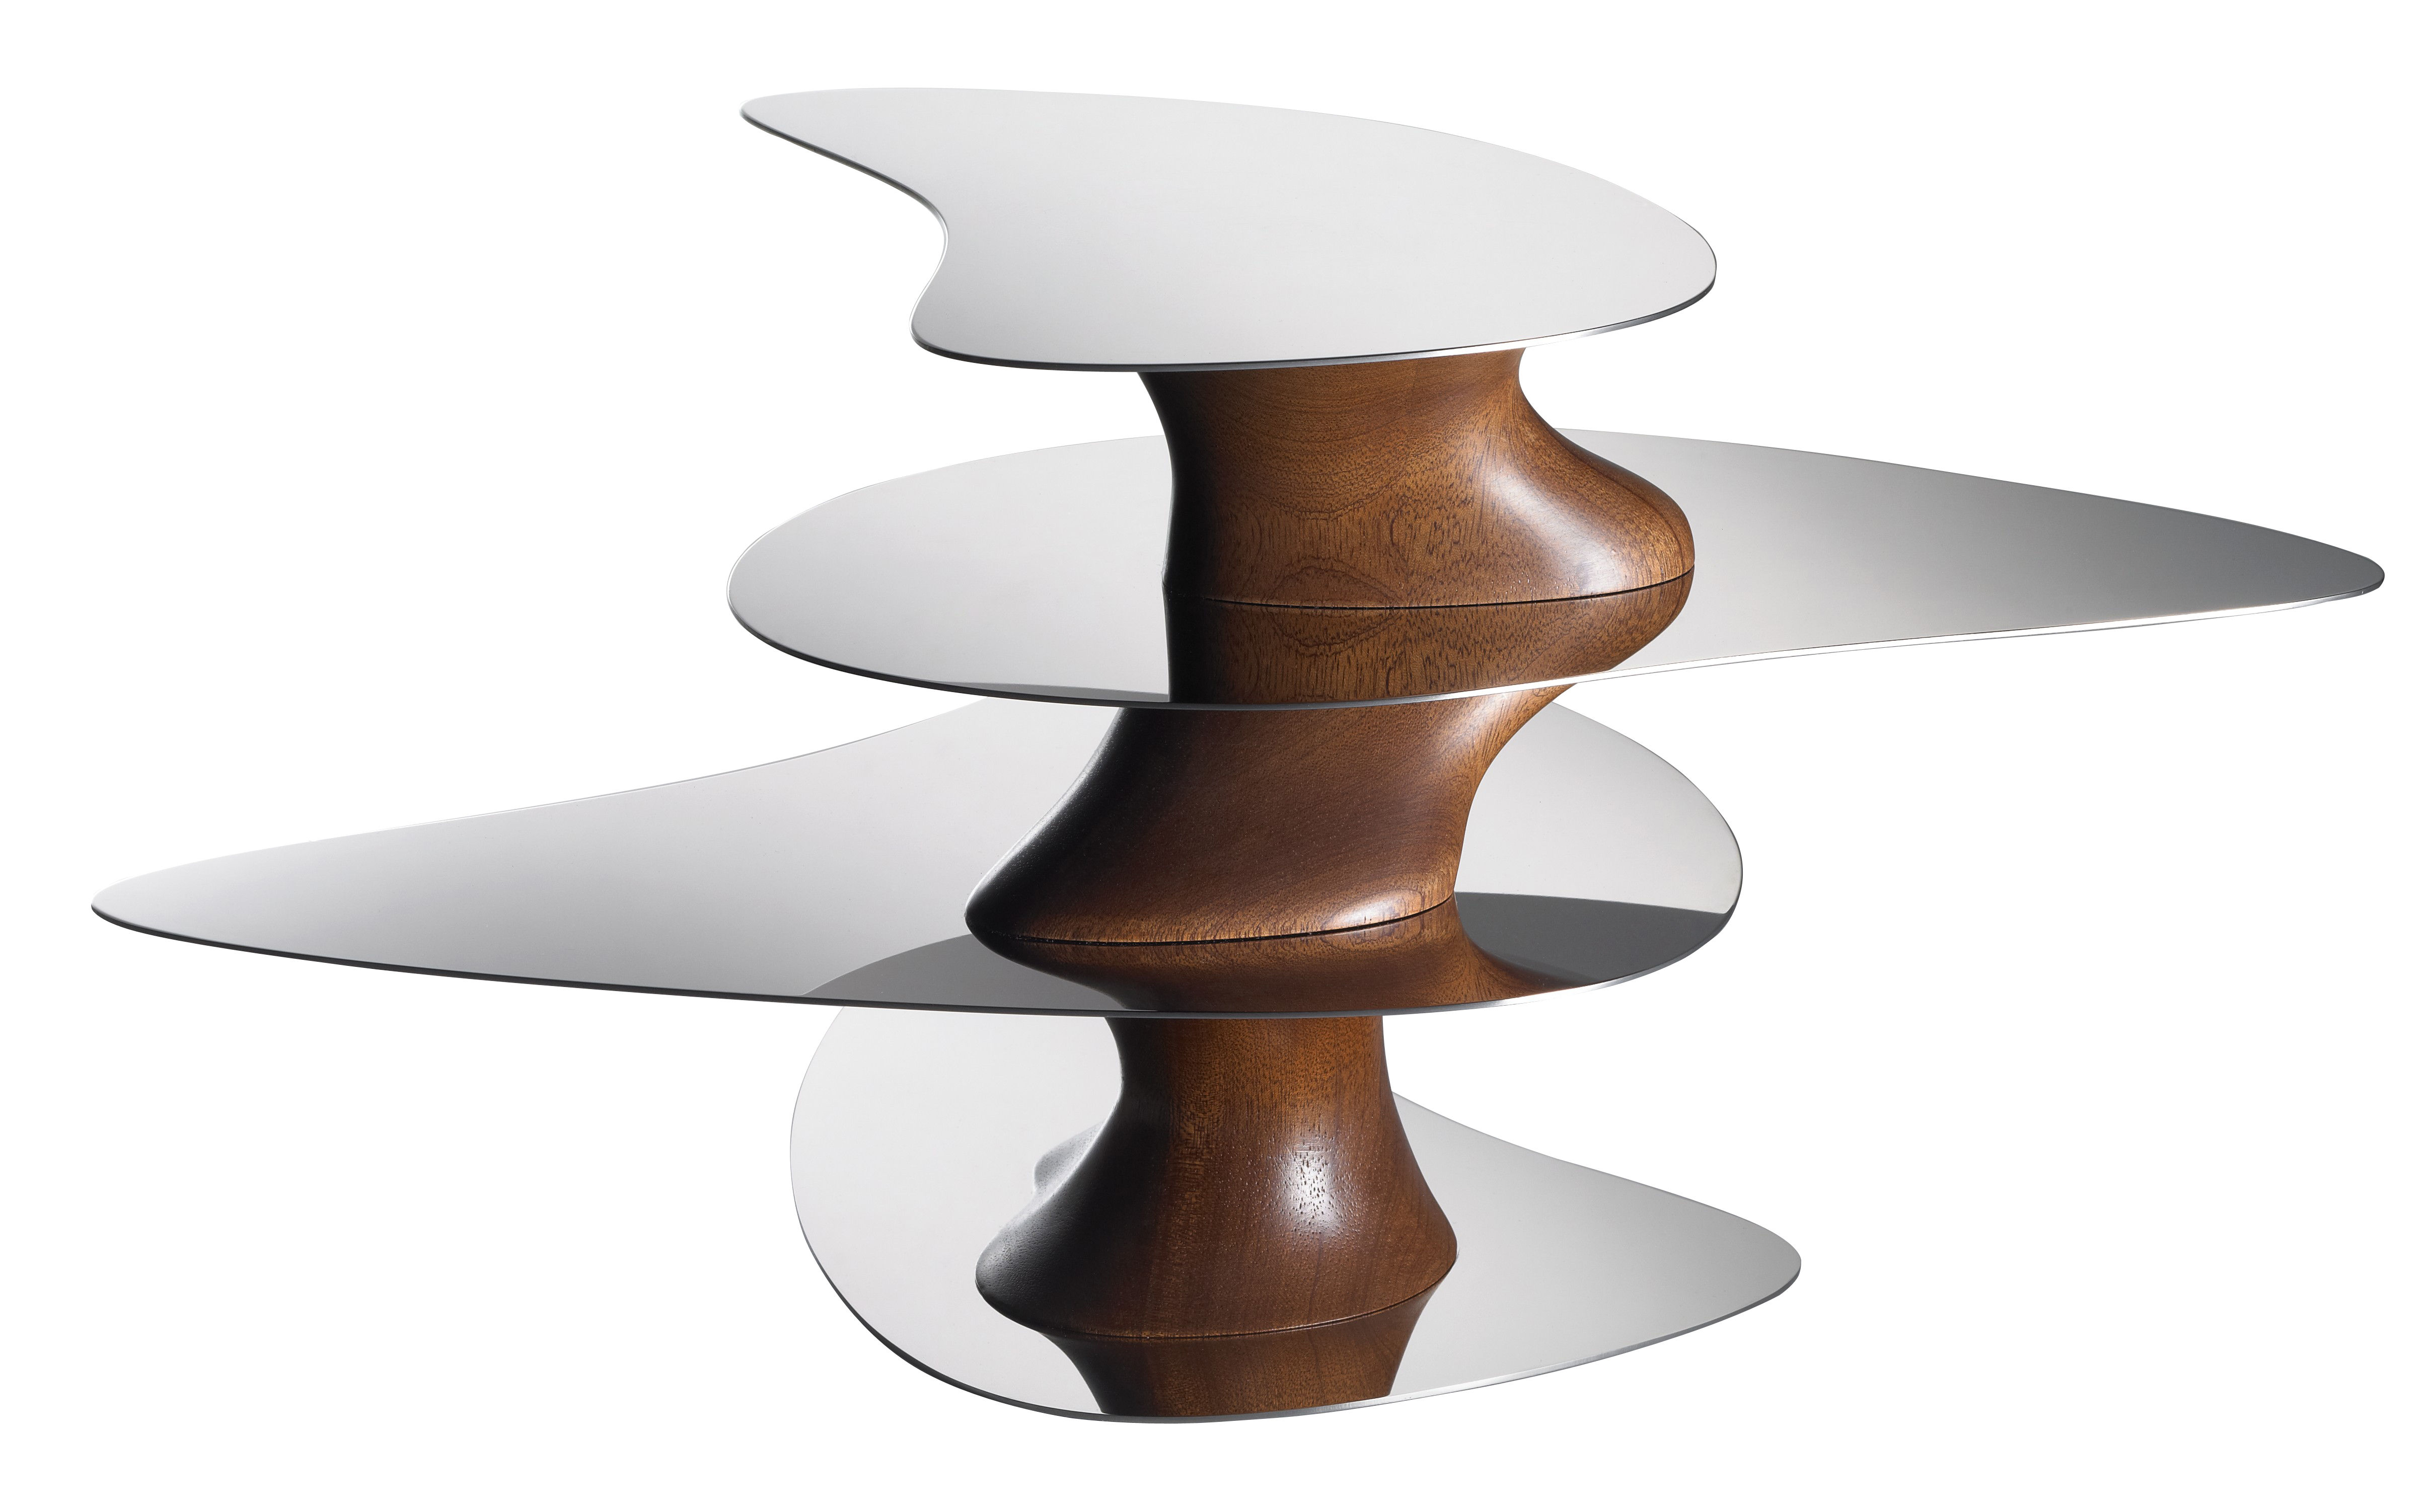 Tischkultur - Platten - Floating Earth Tablett Tischaufsatz - H 22 cm - Alessi - Edelstahl glänzend / Holz - polierter rostfreier Stahl